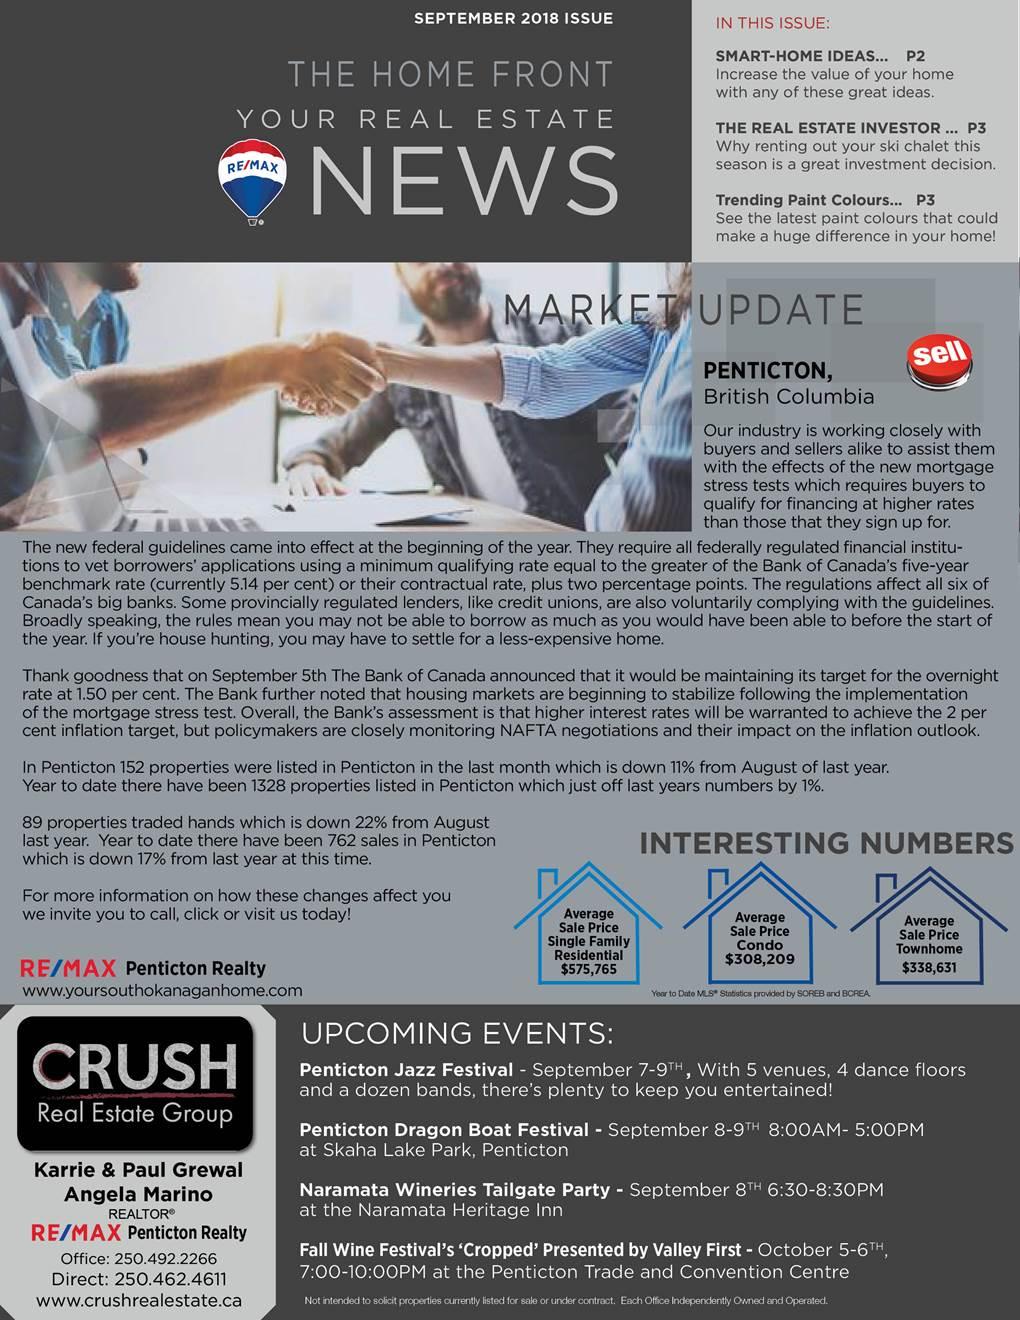 South Okanagan Real Estate News – Sept 2018